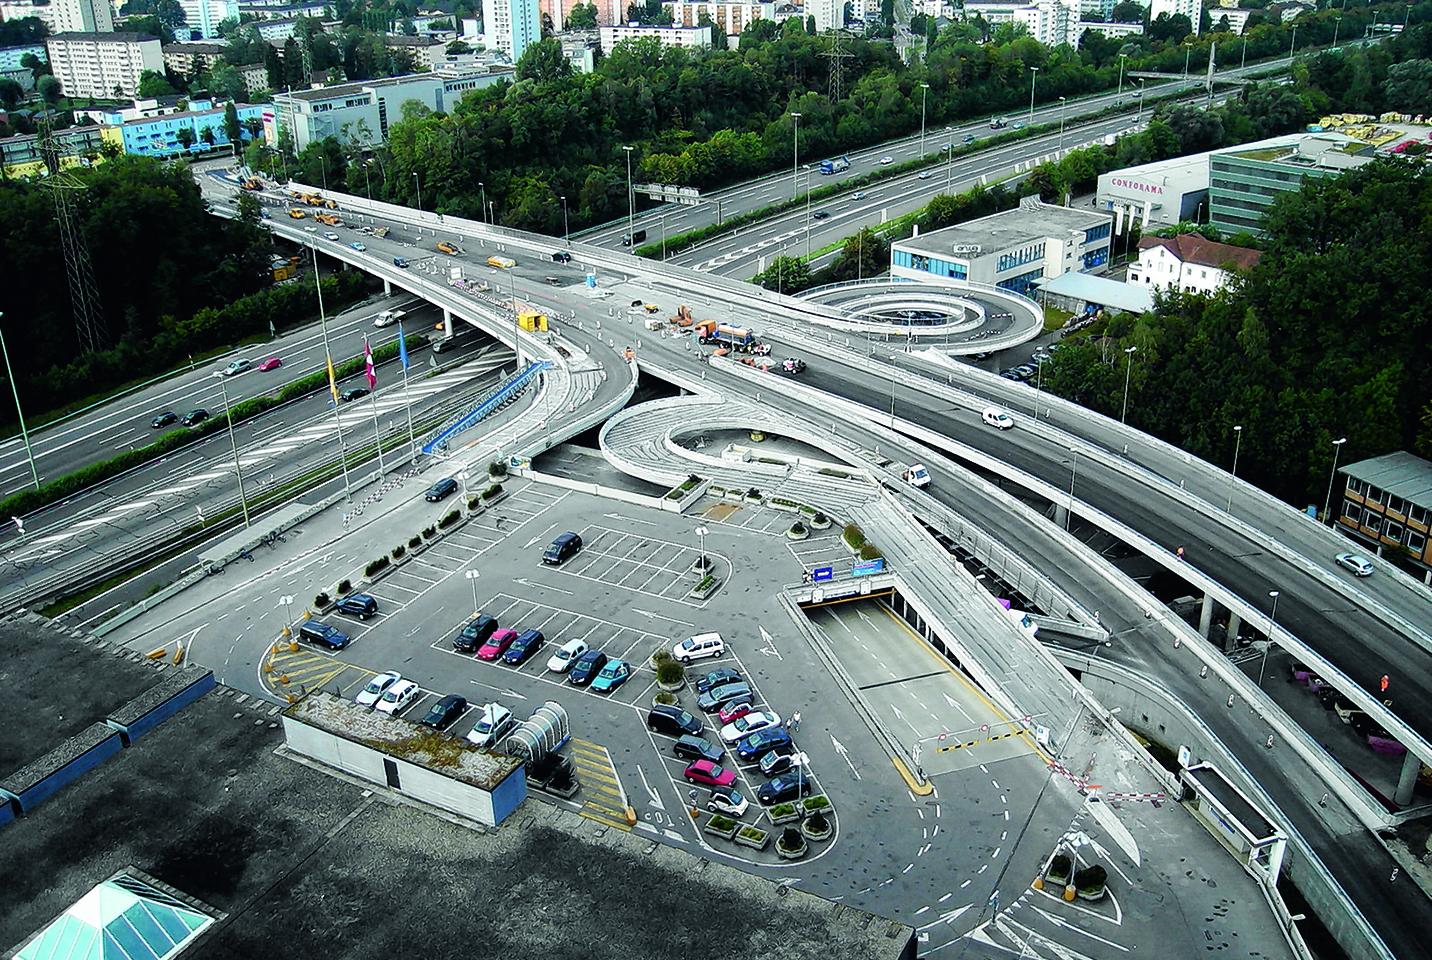 Ingenieur-Bau Glatt-Tower